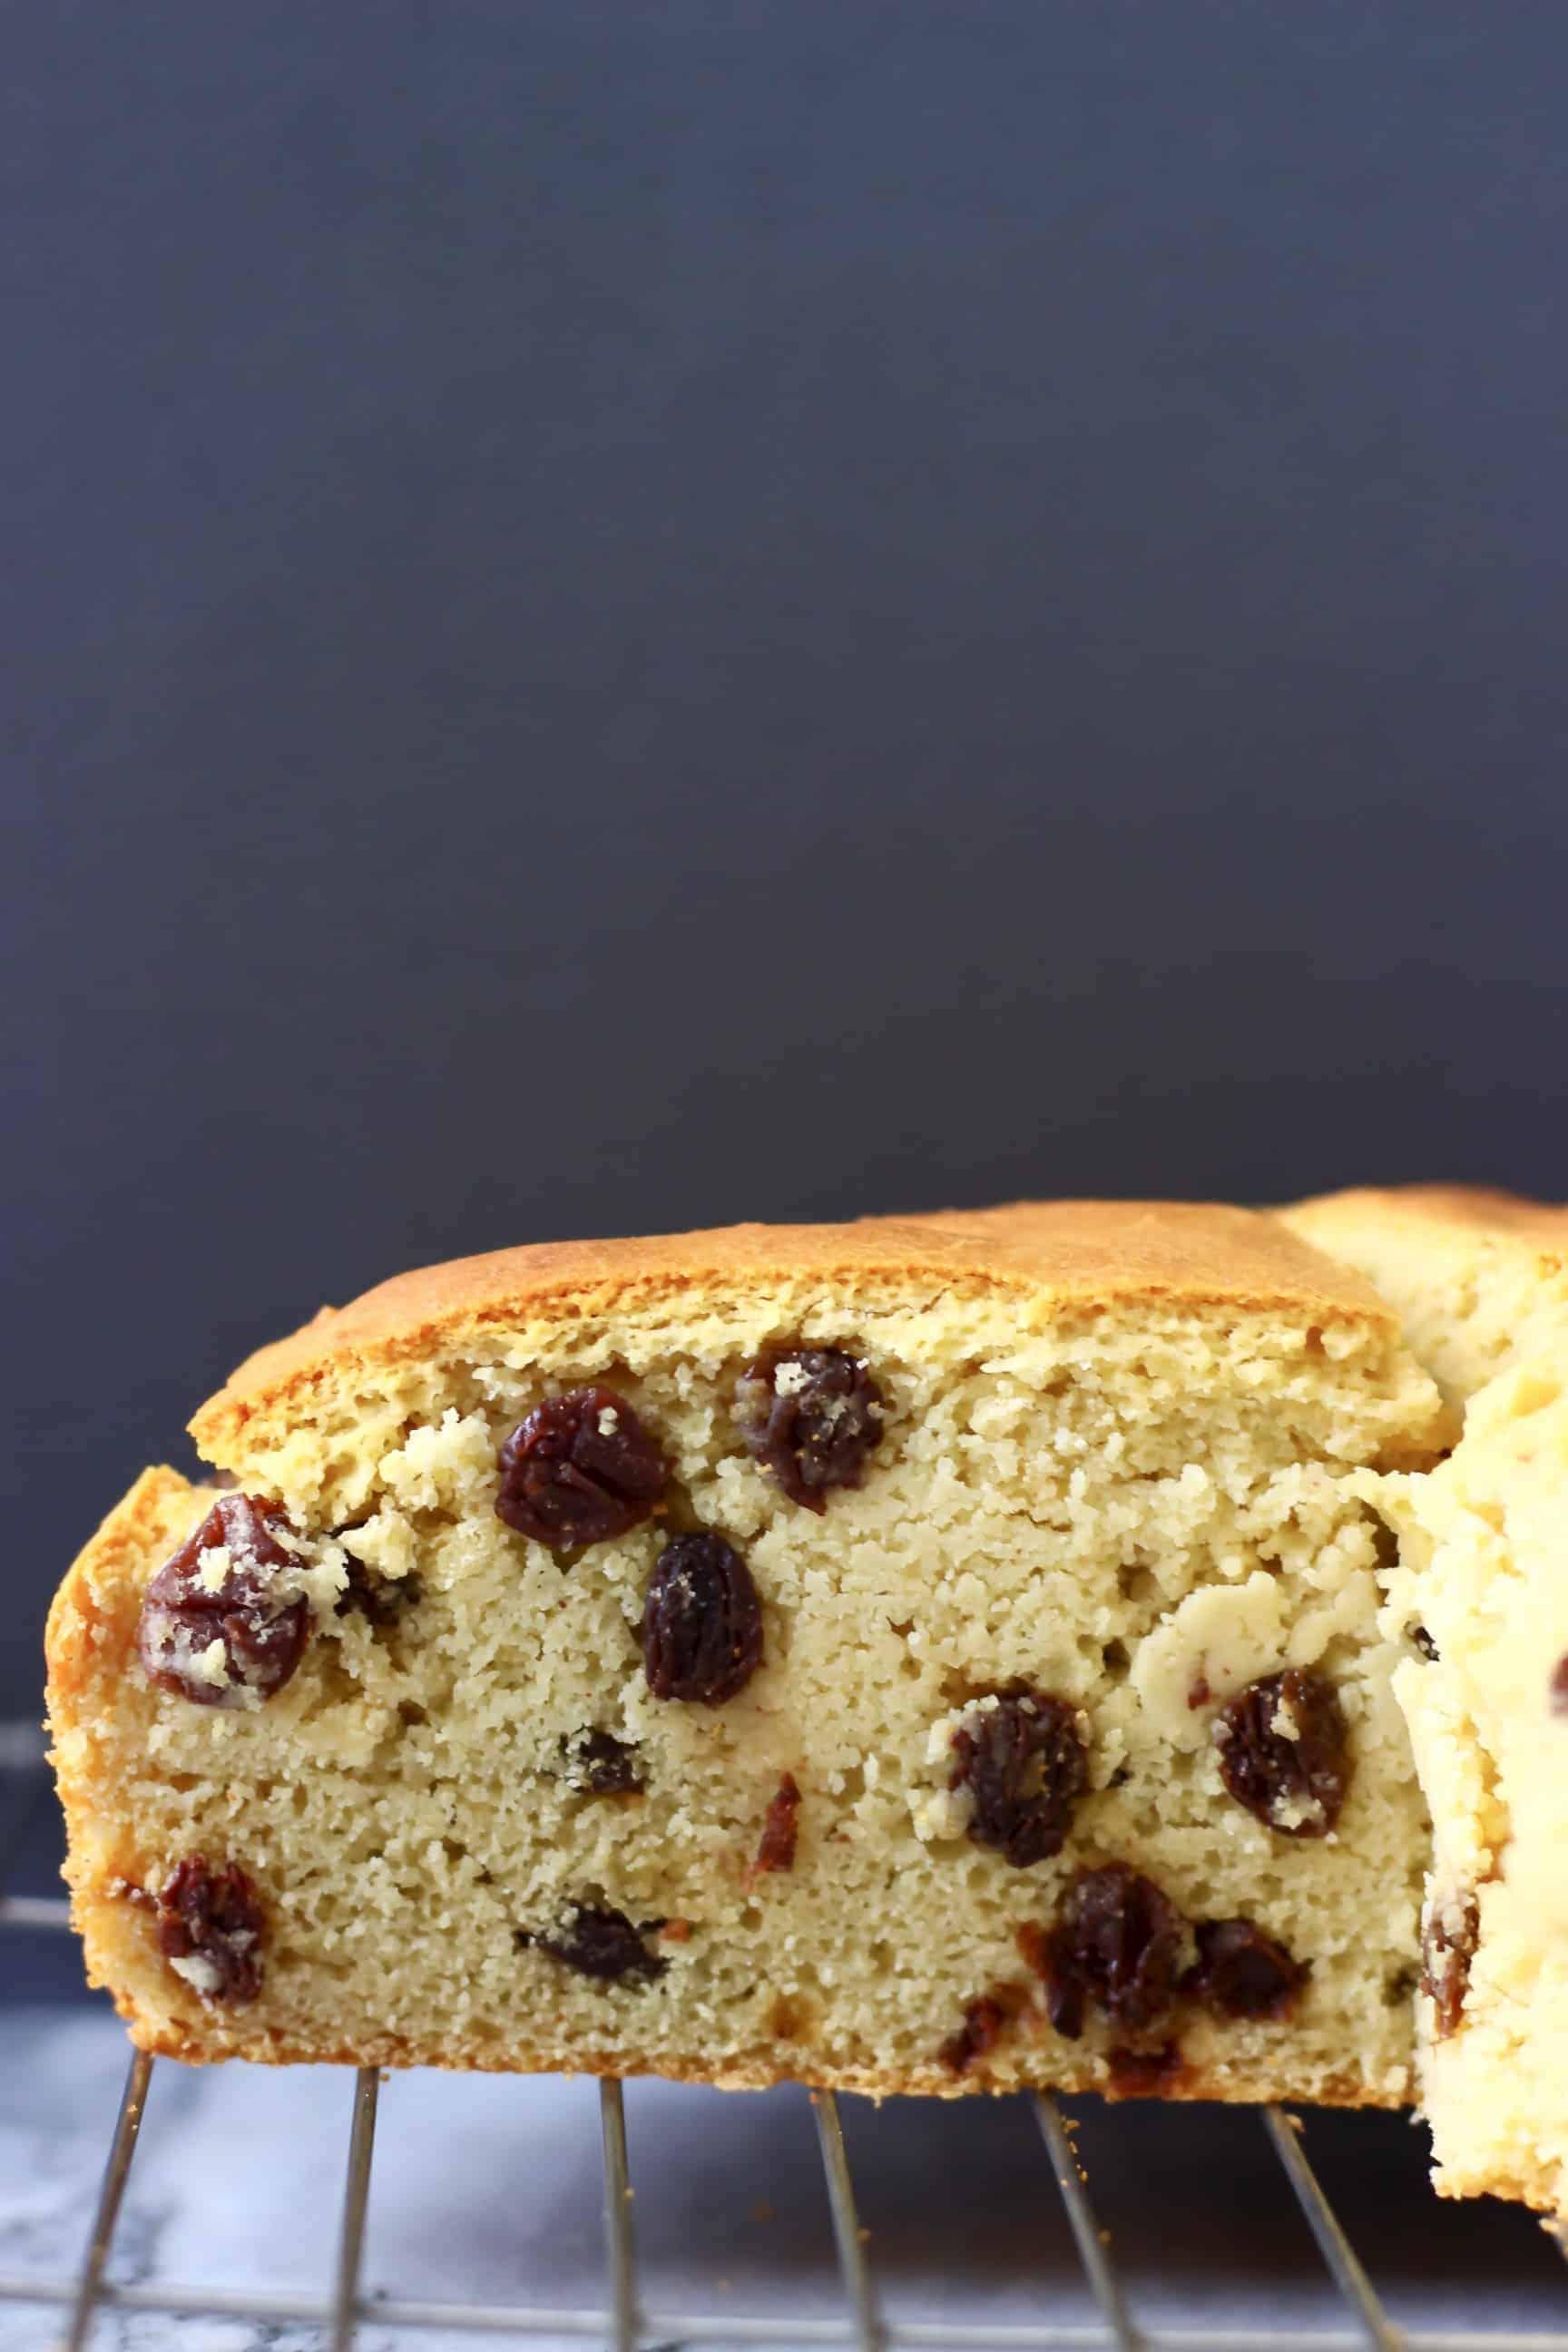 A sliced loaf of Gluten-Free Vegan Irish Soda Bread with raisins on a wire rack